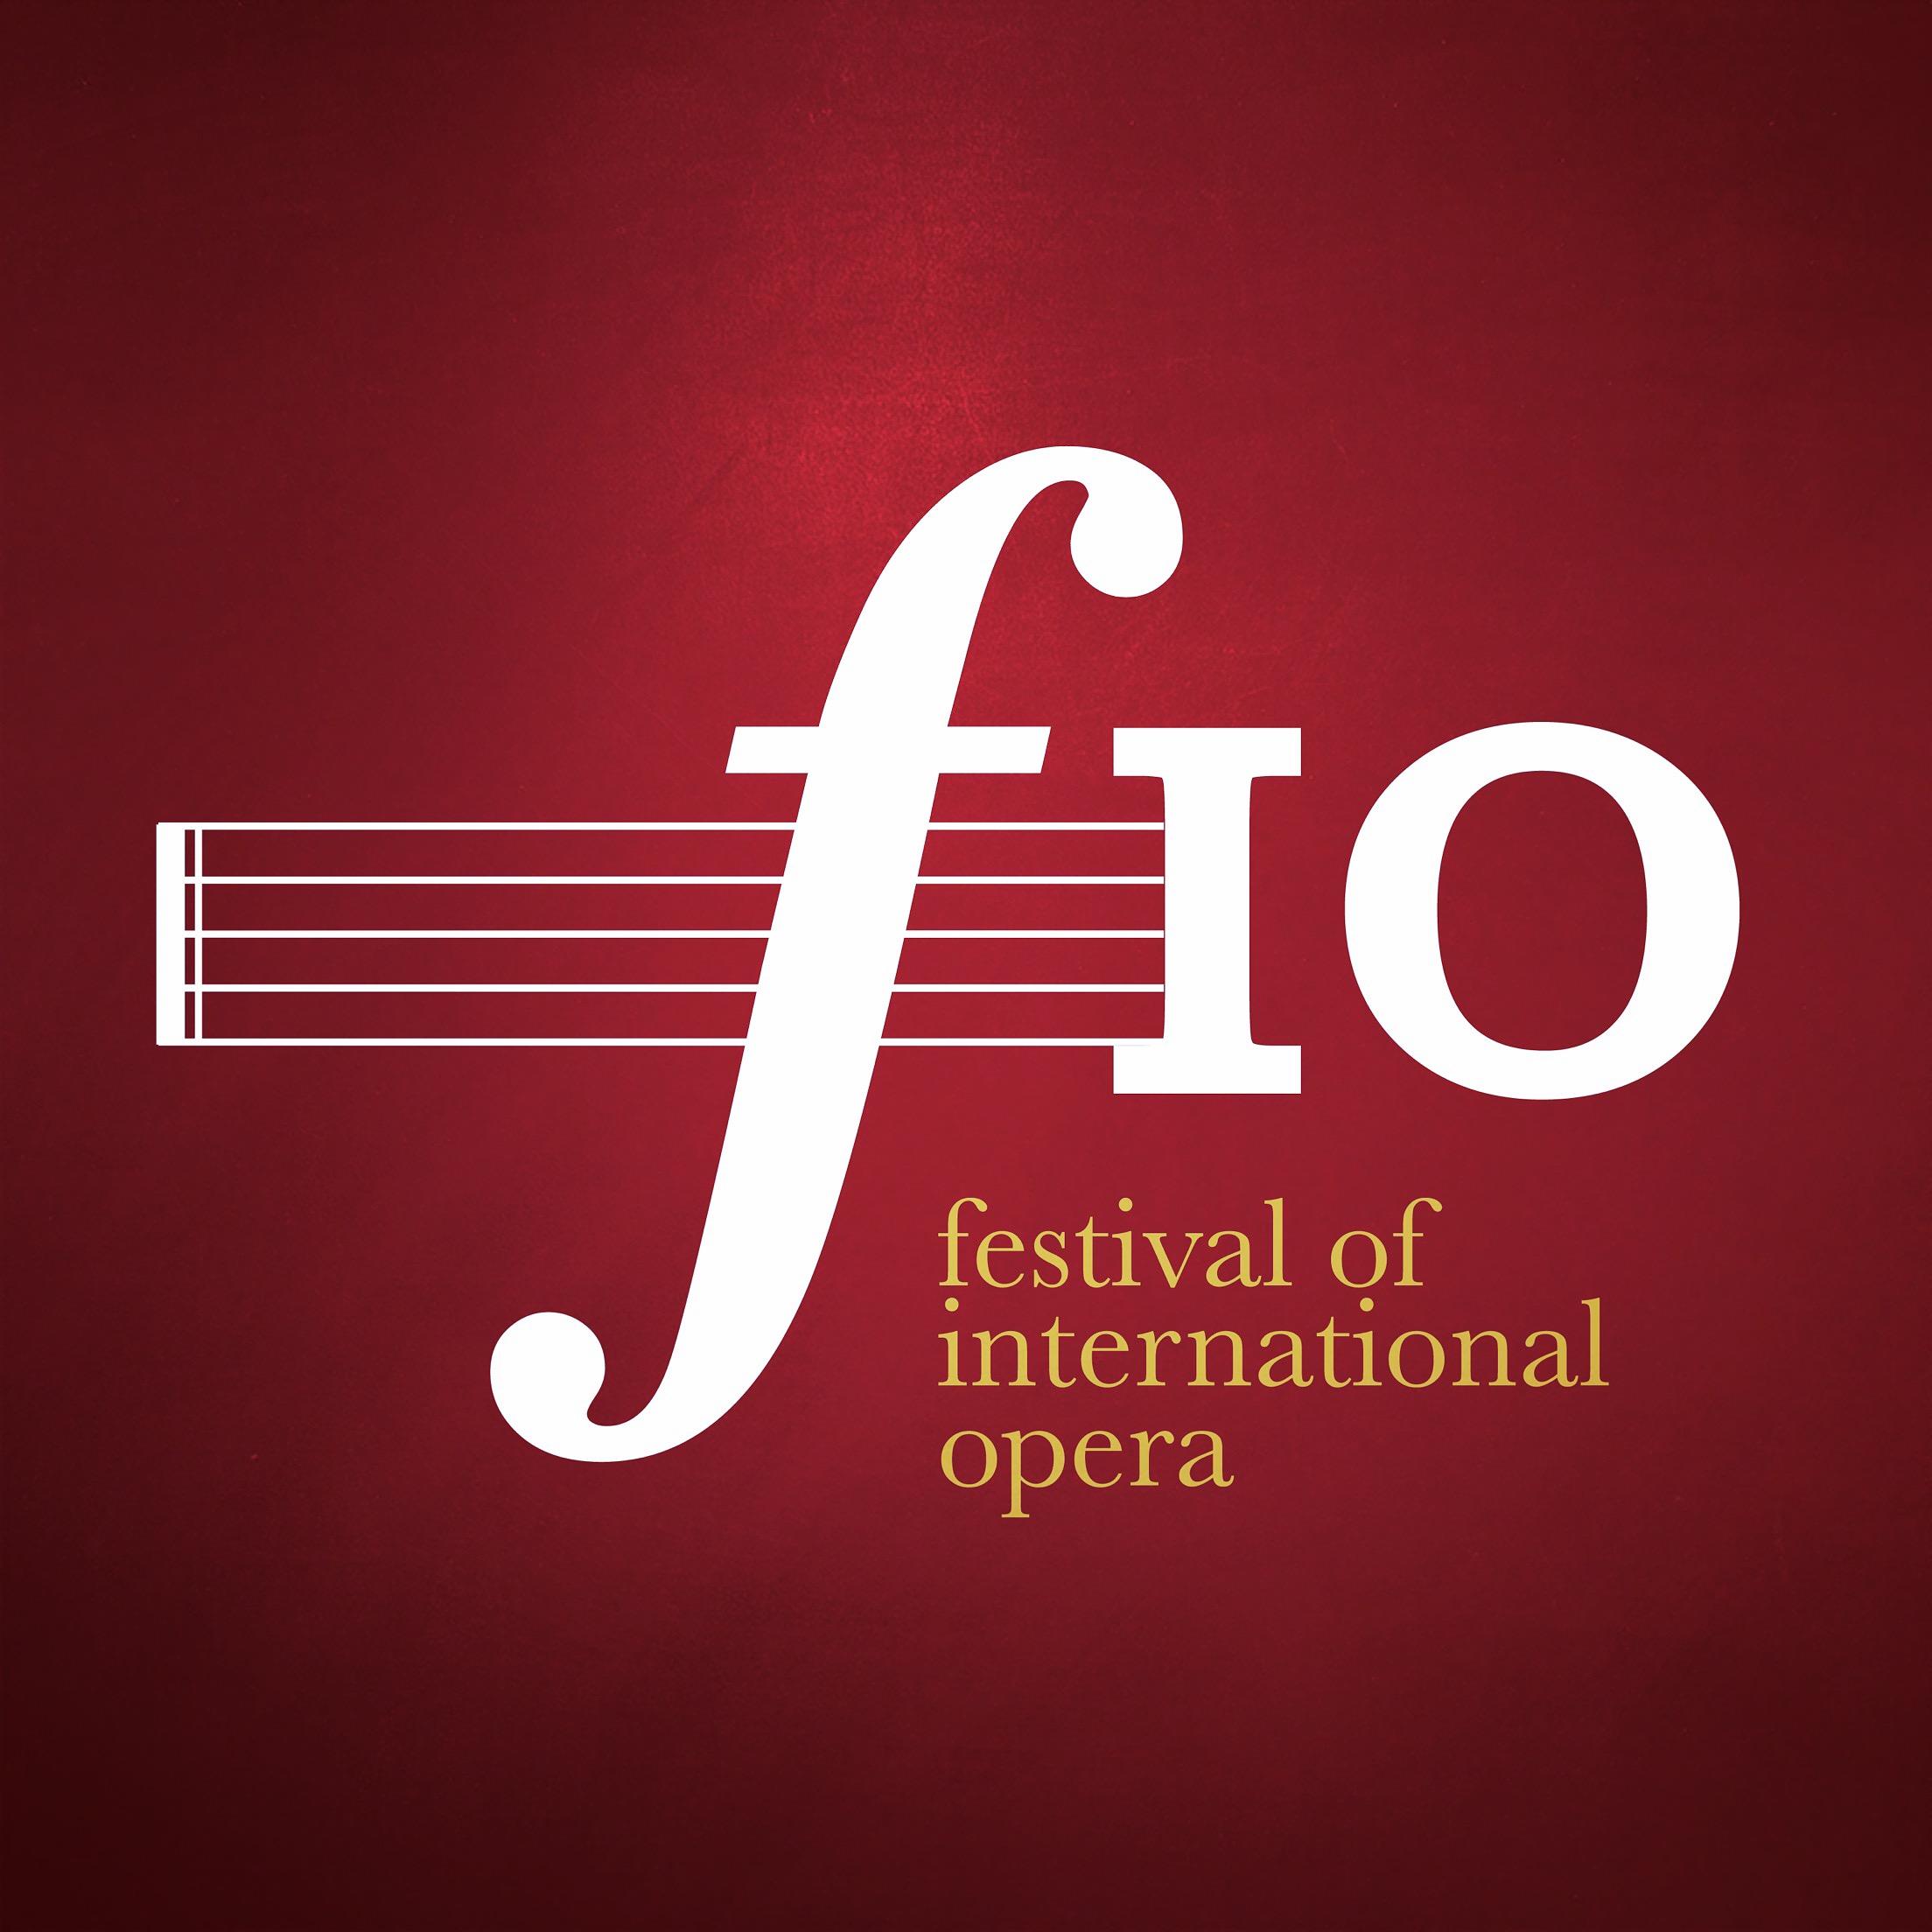 festival-of-international-opera